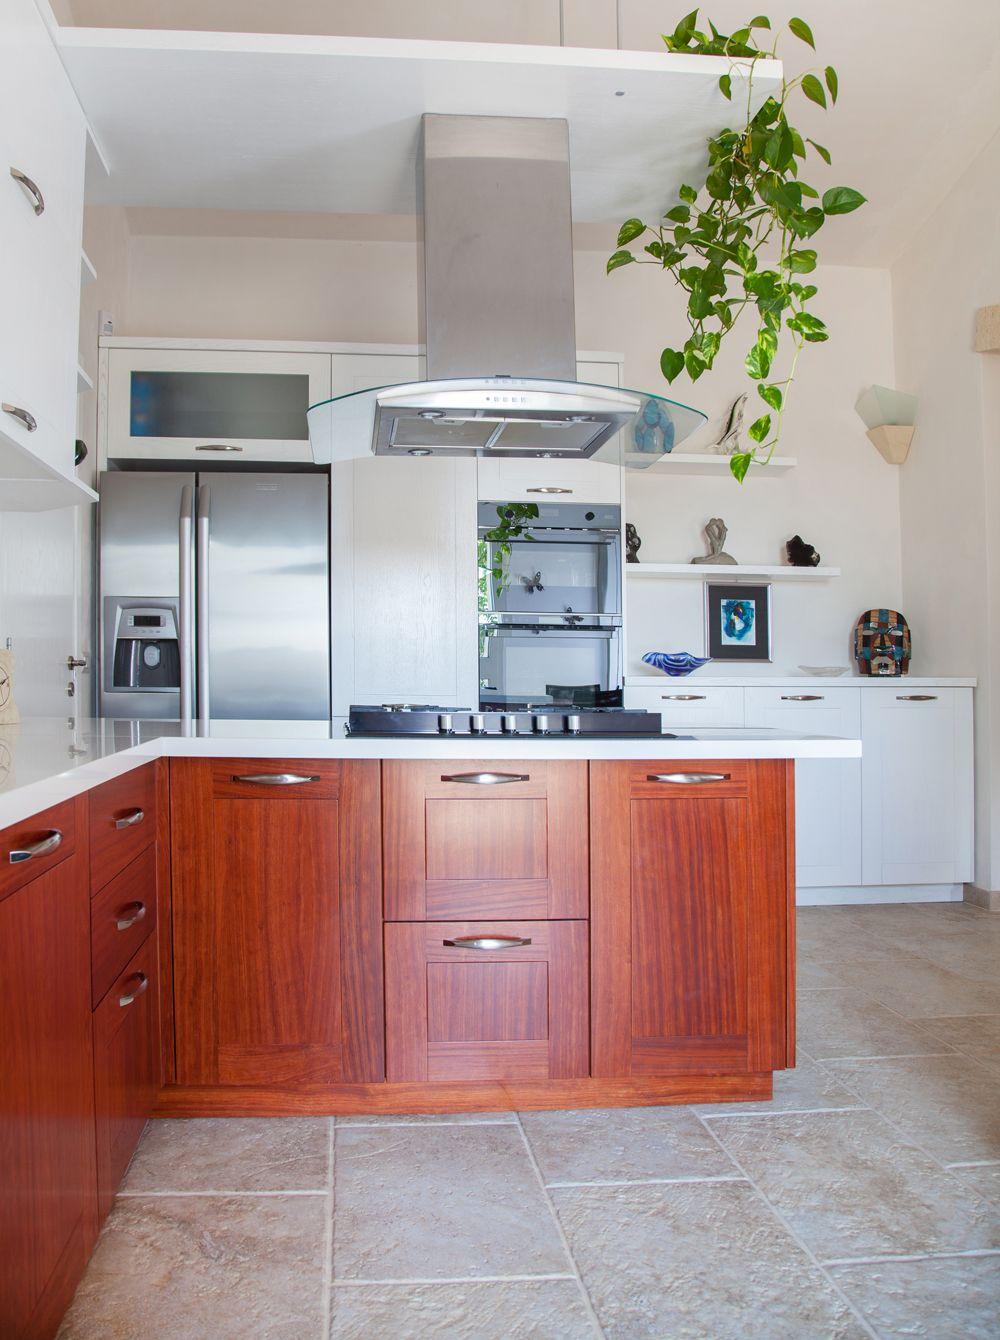 Bramato Cucine | Cucina in bubinga africana e rovere bianco poro ...